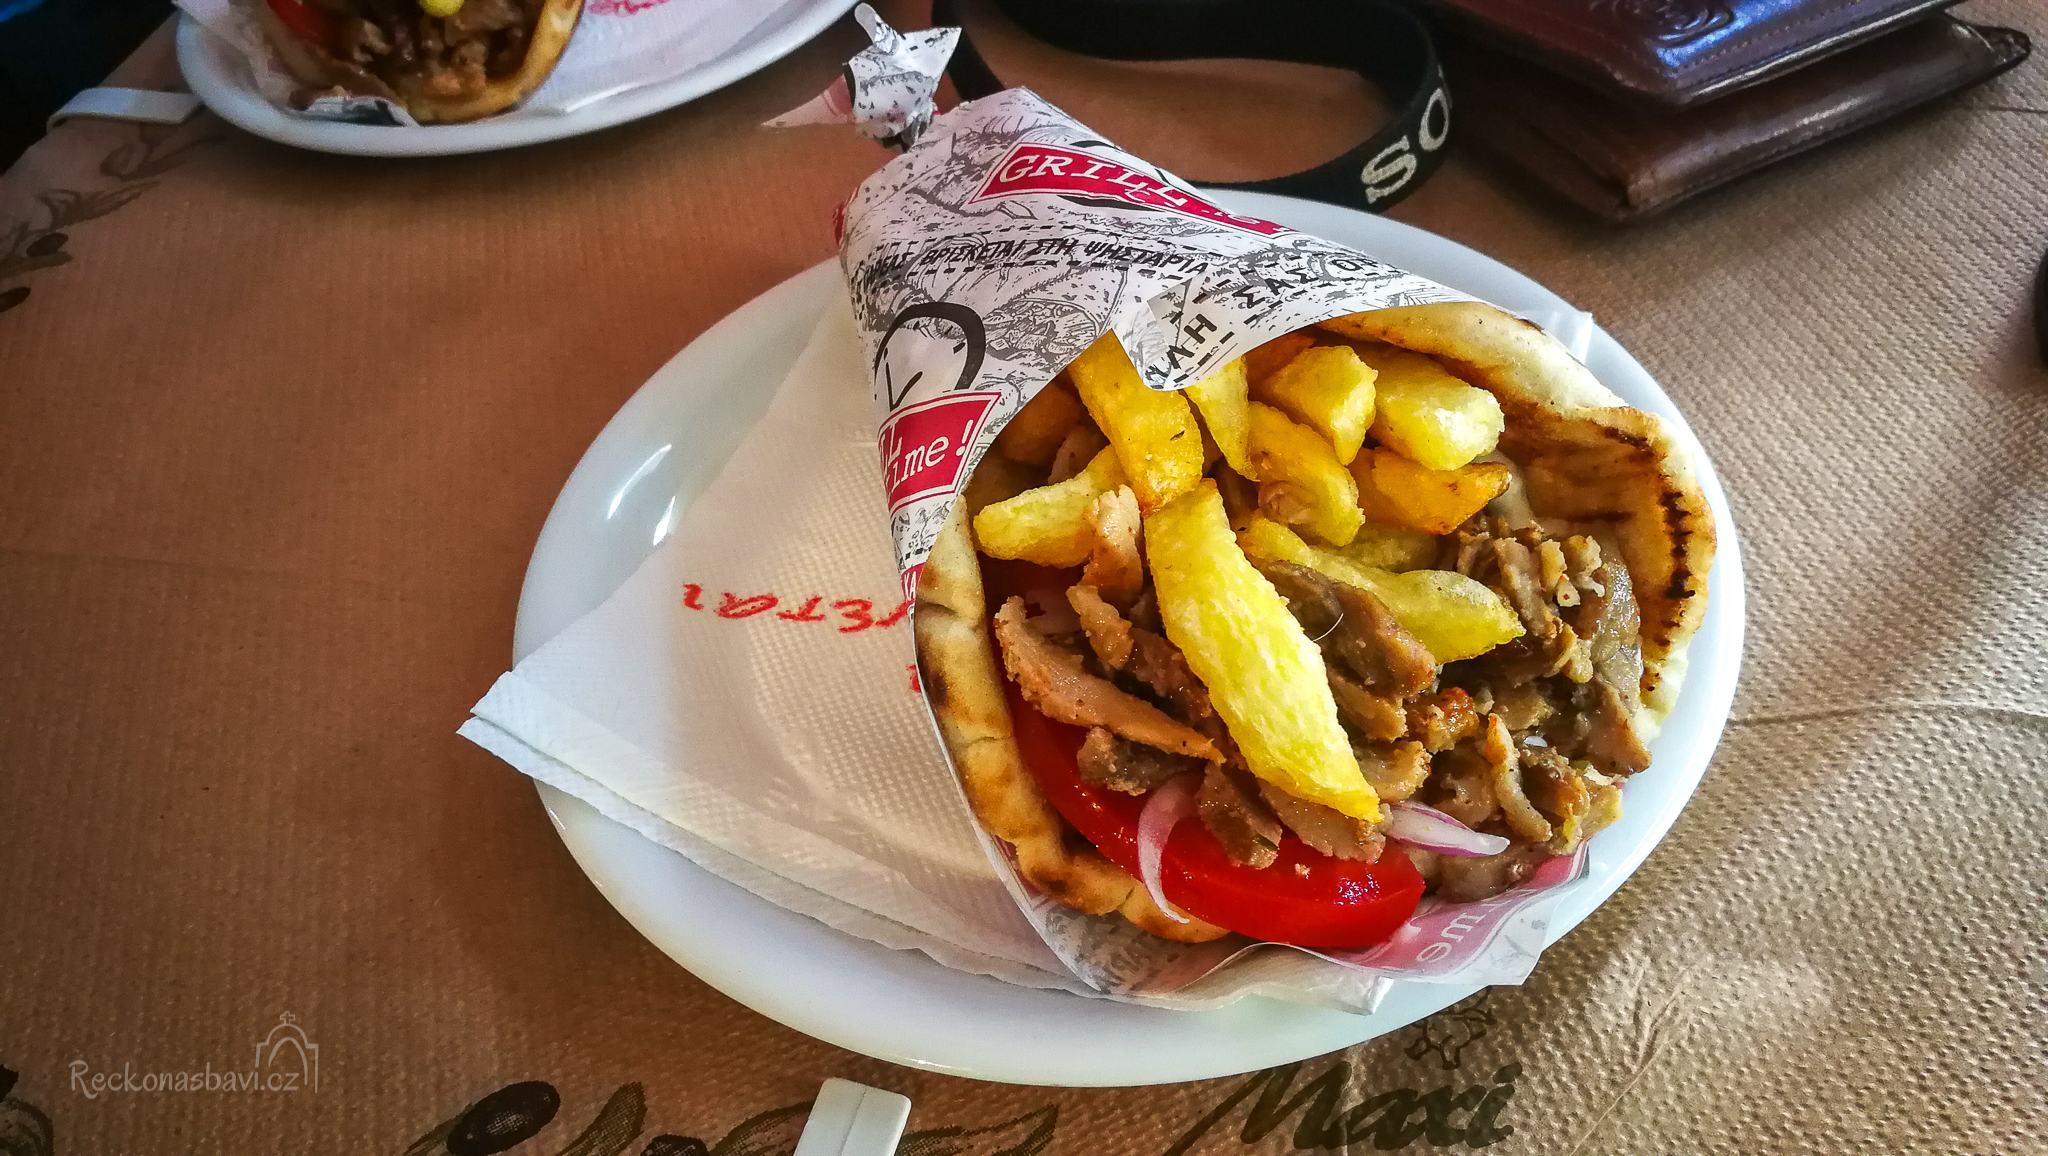 Gyros chirino (vepřový) - to je základ řecké streetfood gastronomie